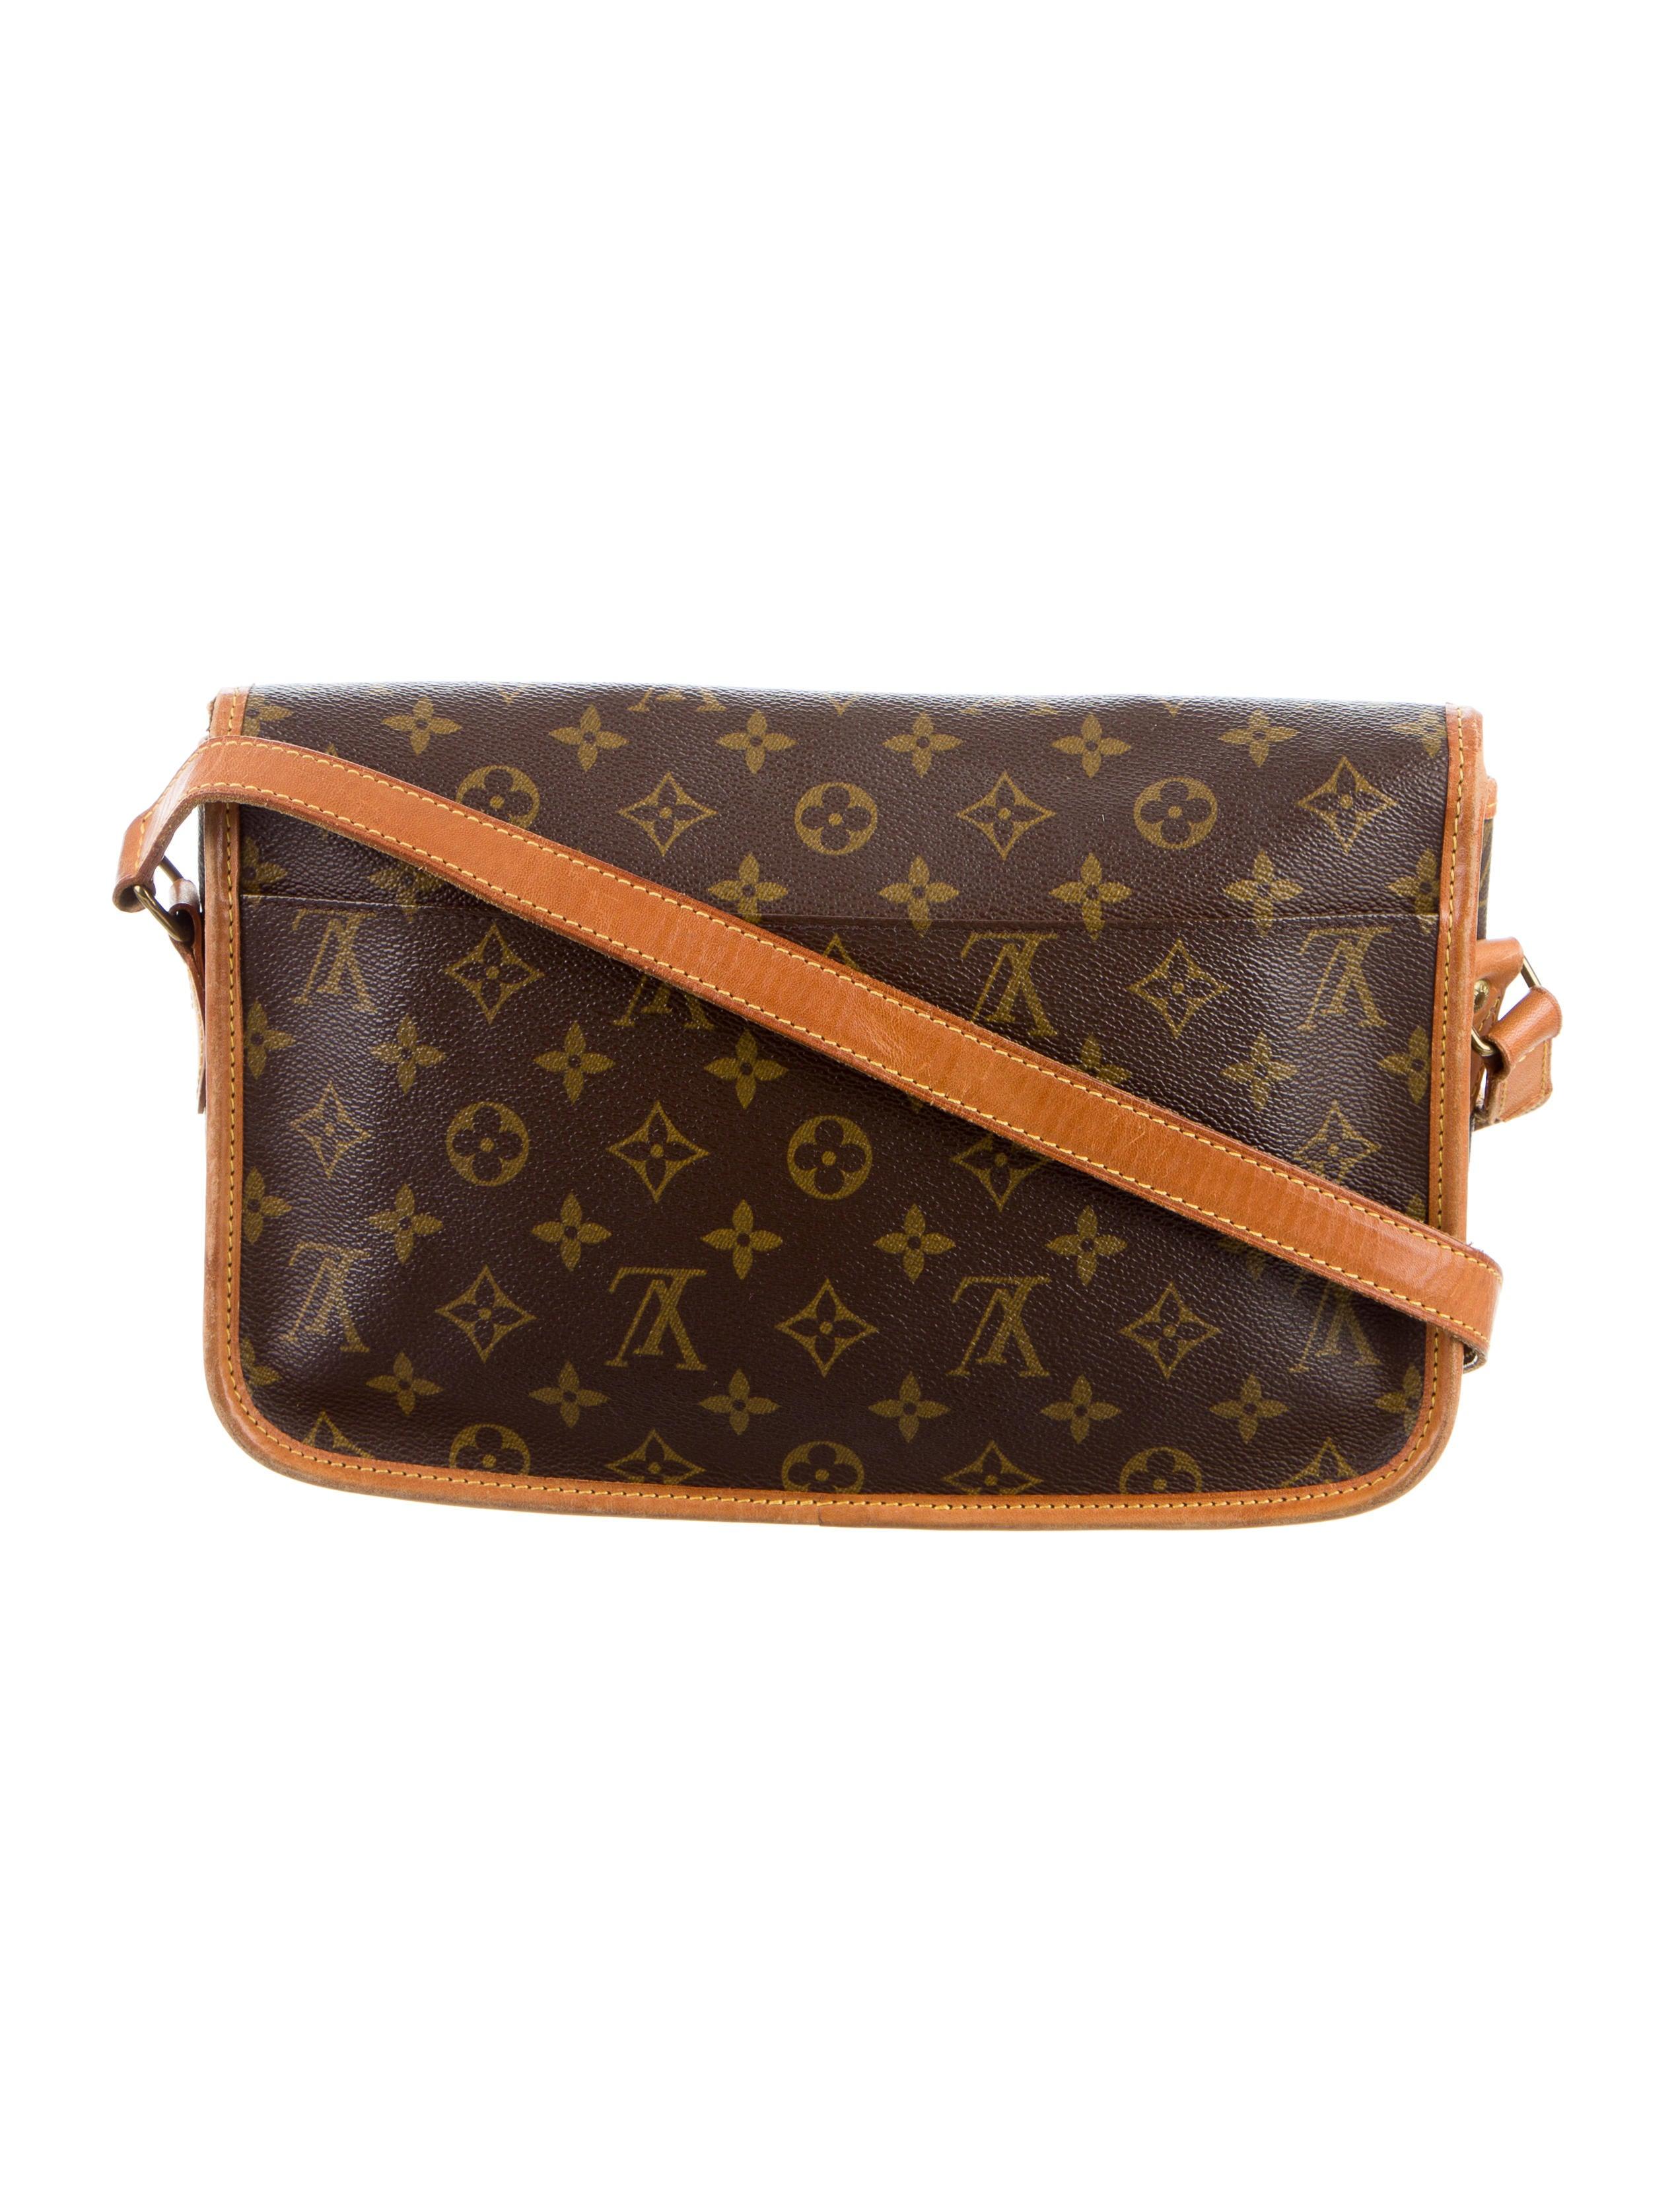 Sac Louis Vuitton Vrai : Louis vuitton monogram sac gibeciere mm handbags